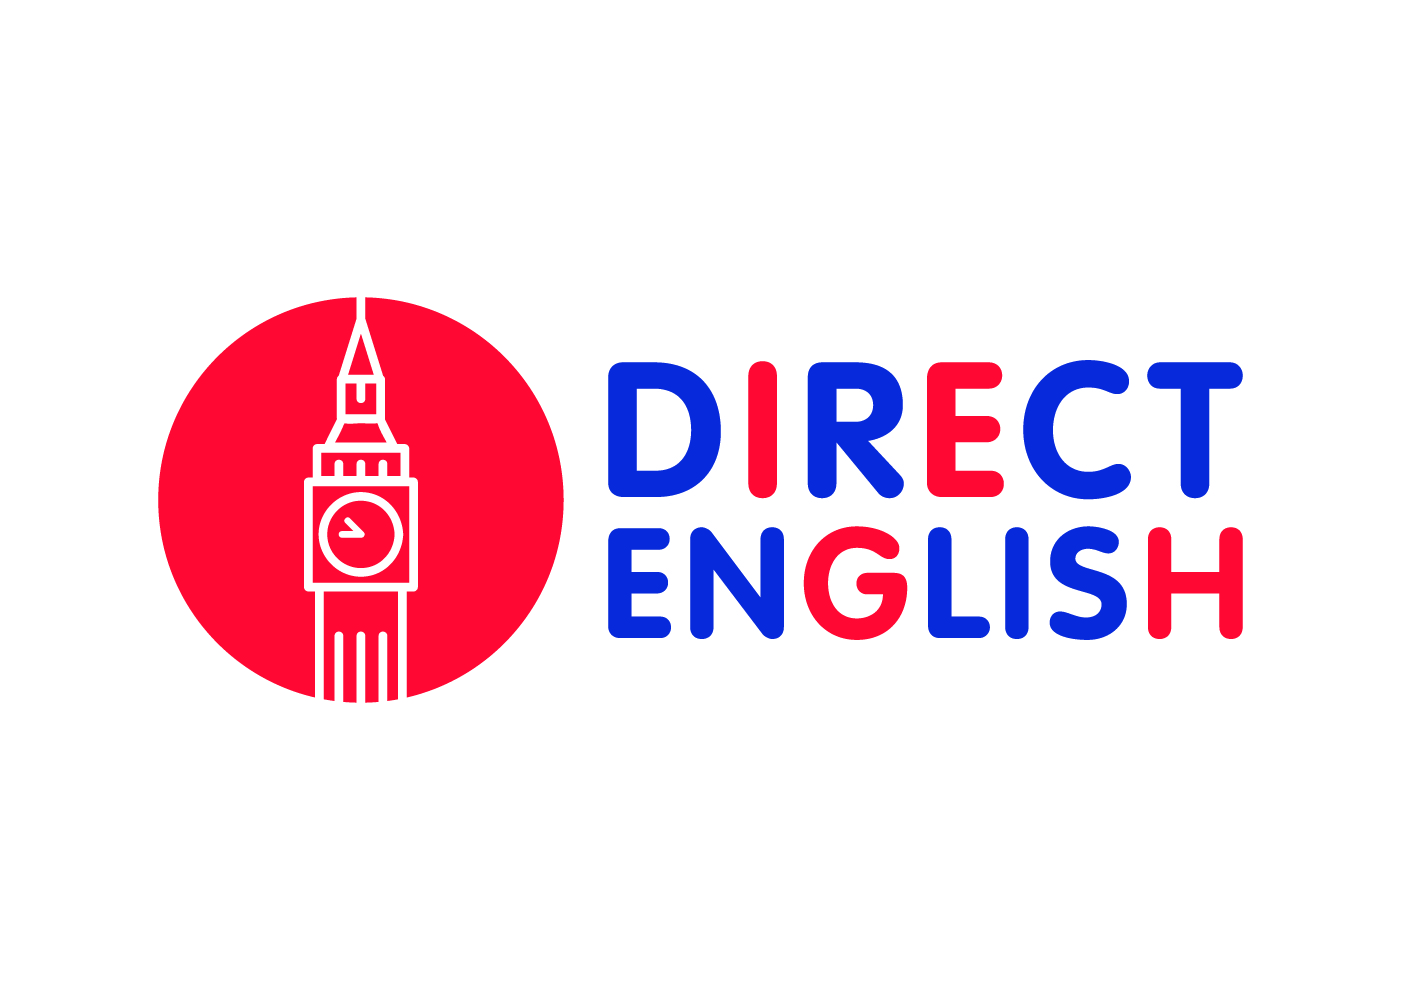 DIRECT ENGLISH_1